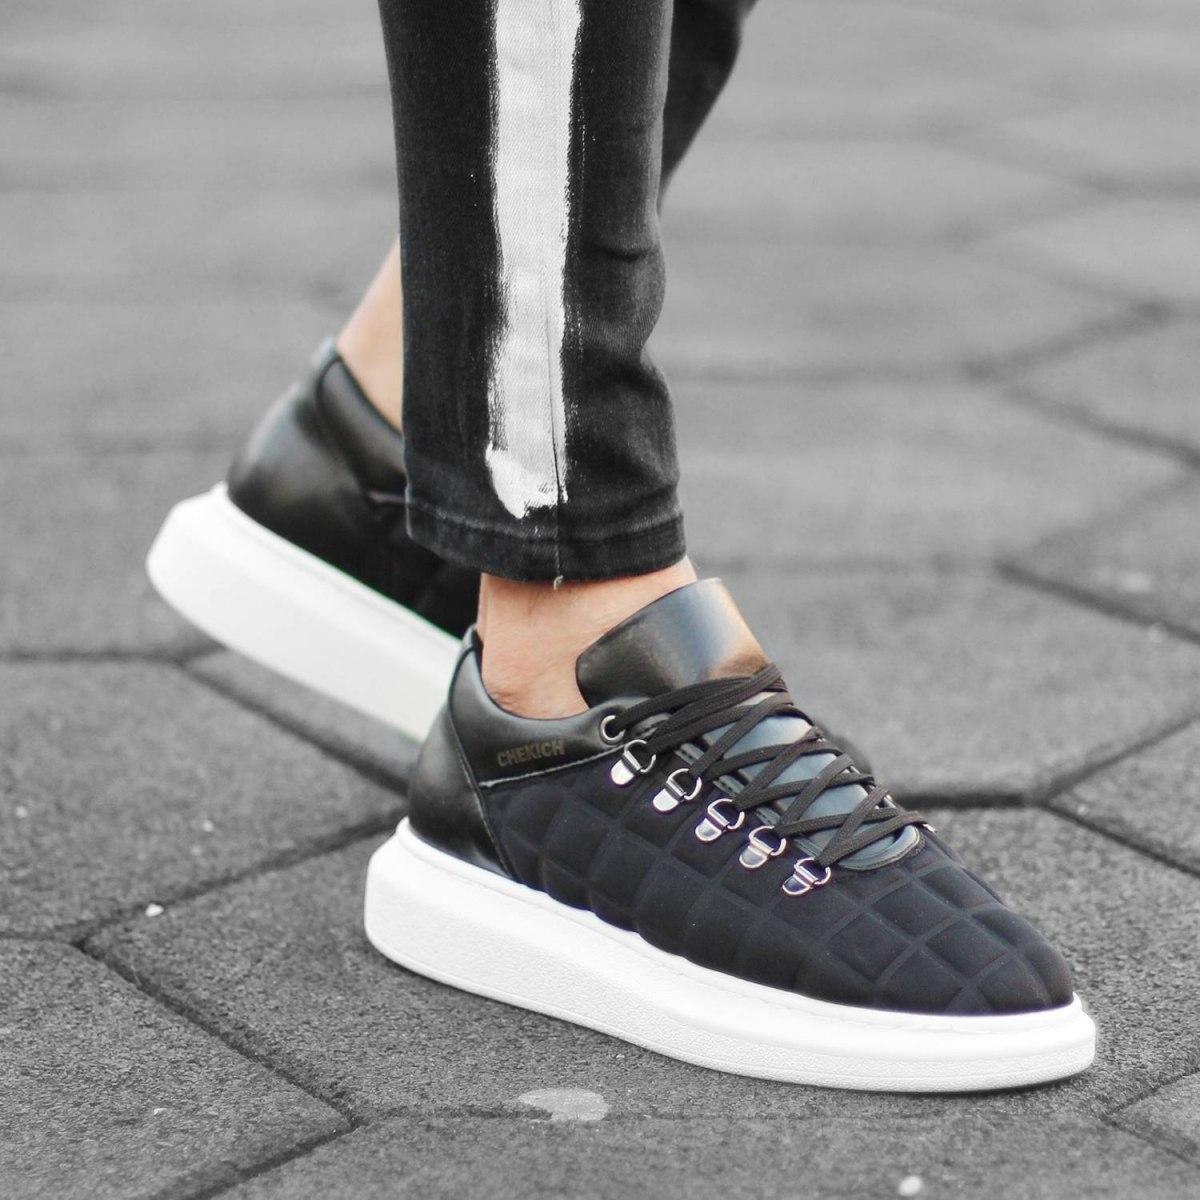 MV Mega Sole Black&White Turtle Shell Sneaker MV Sneaker Collection - 1